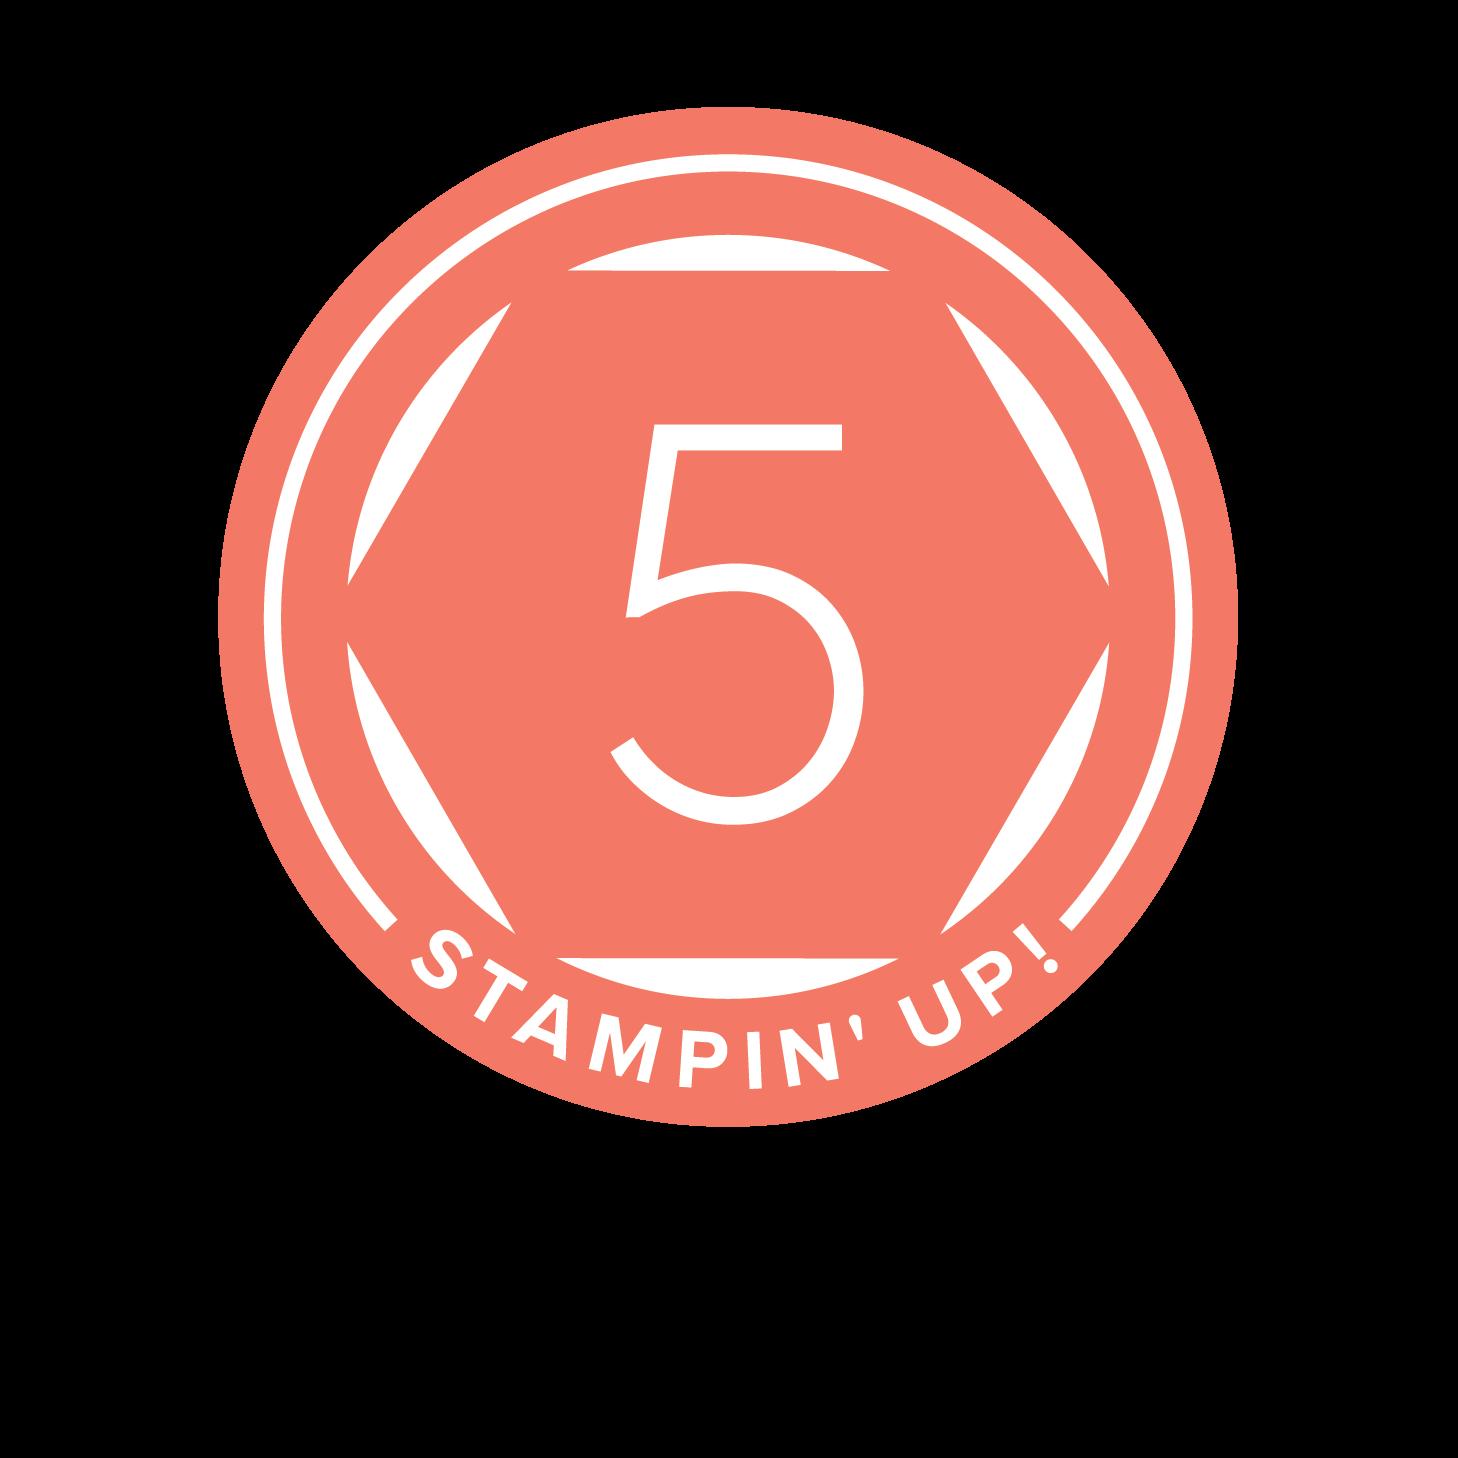 Stampin' up! ®️ Demonstrator